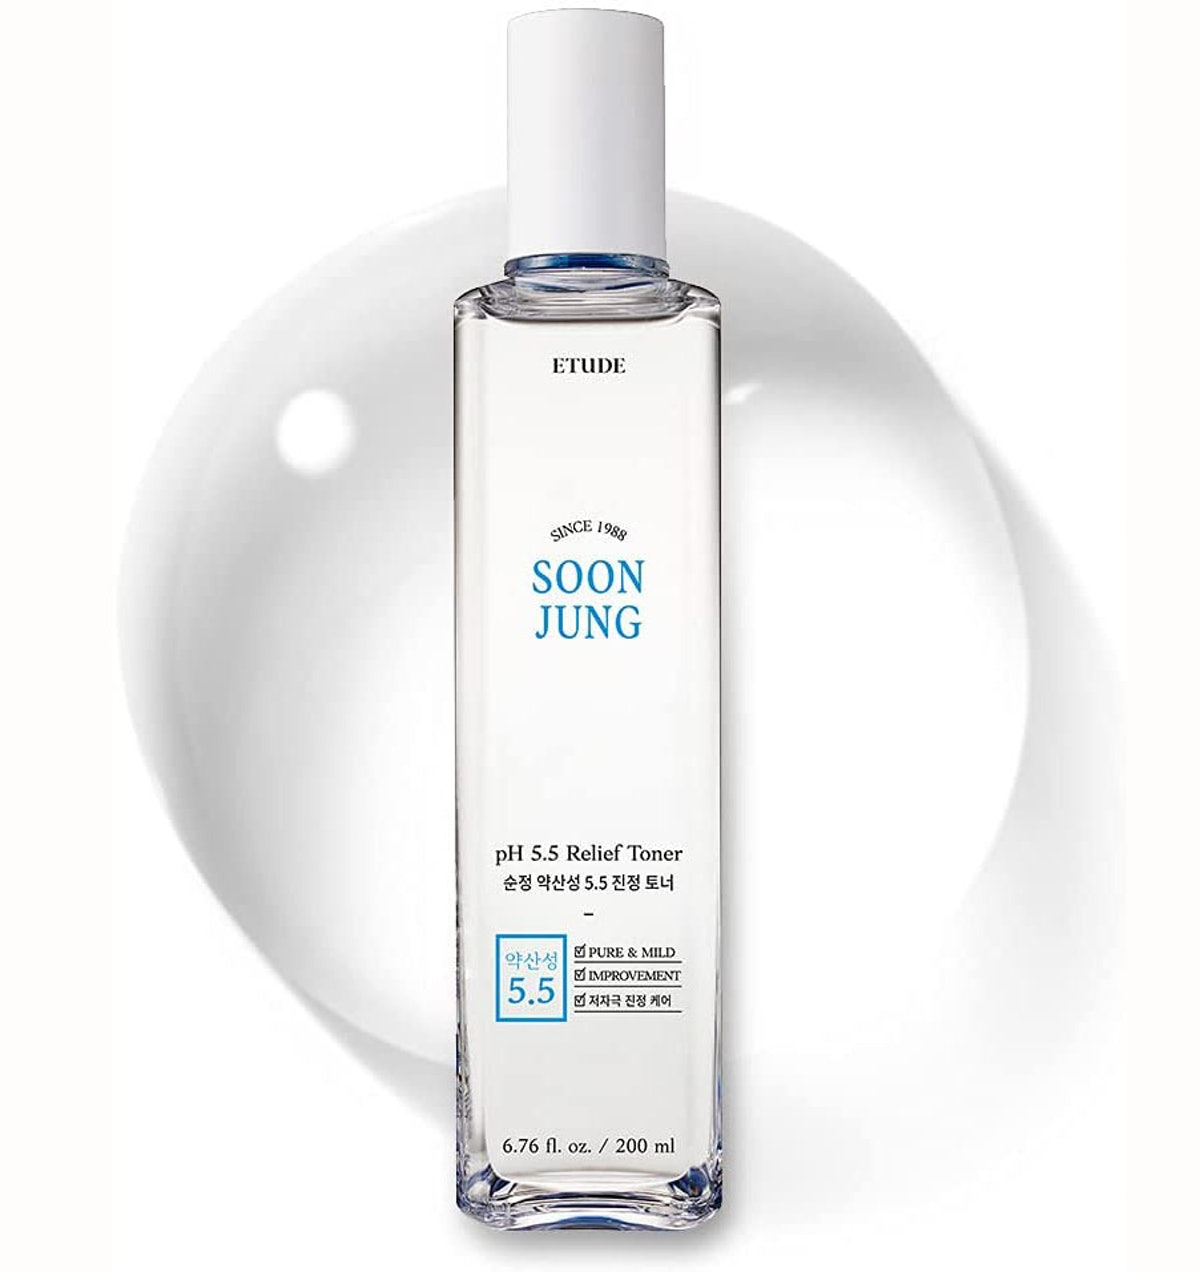 Etude Soonjung pH5.5 Relief Toner